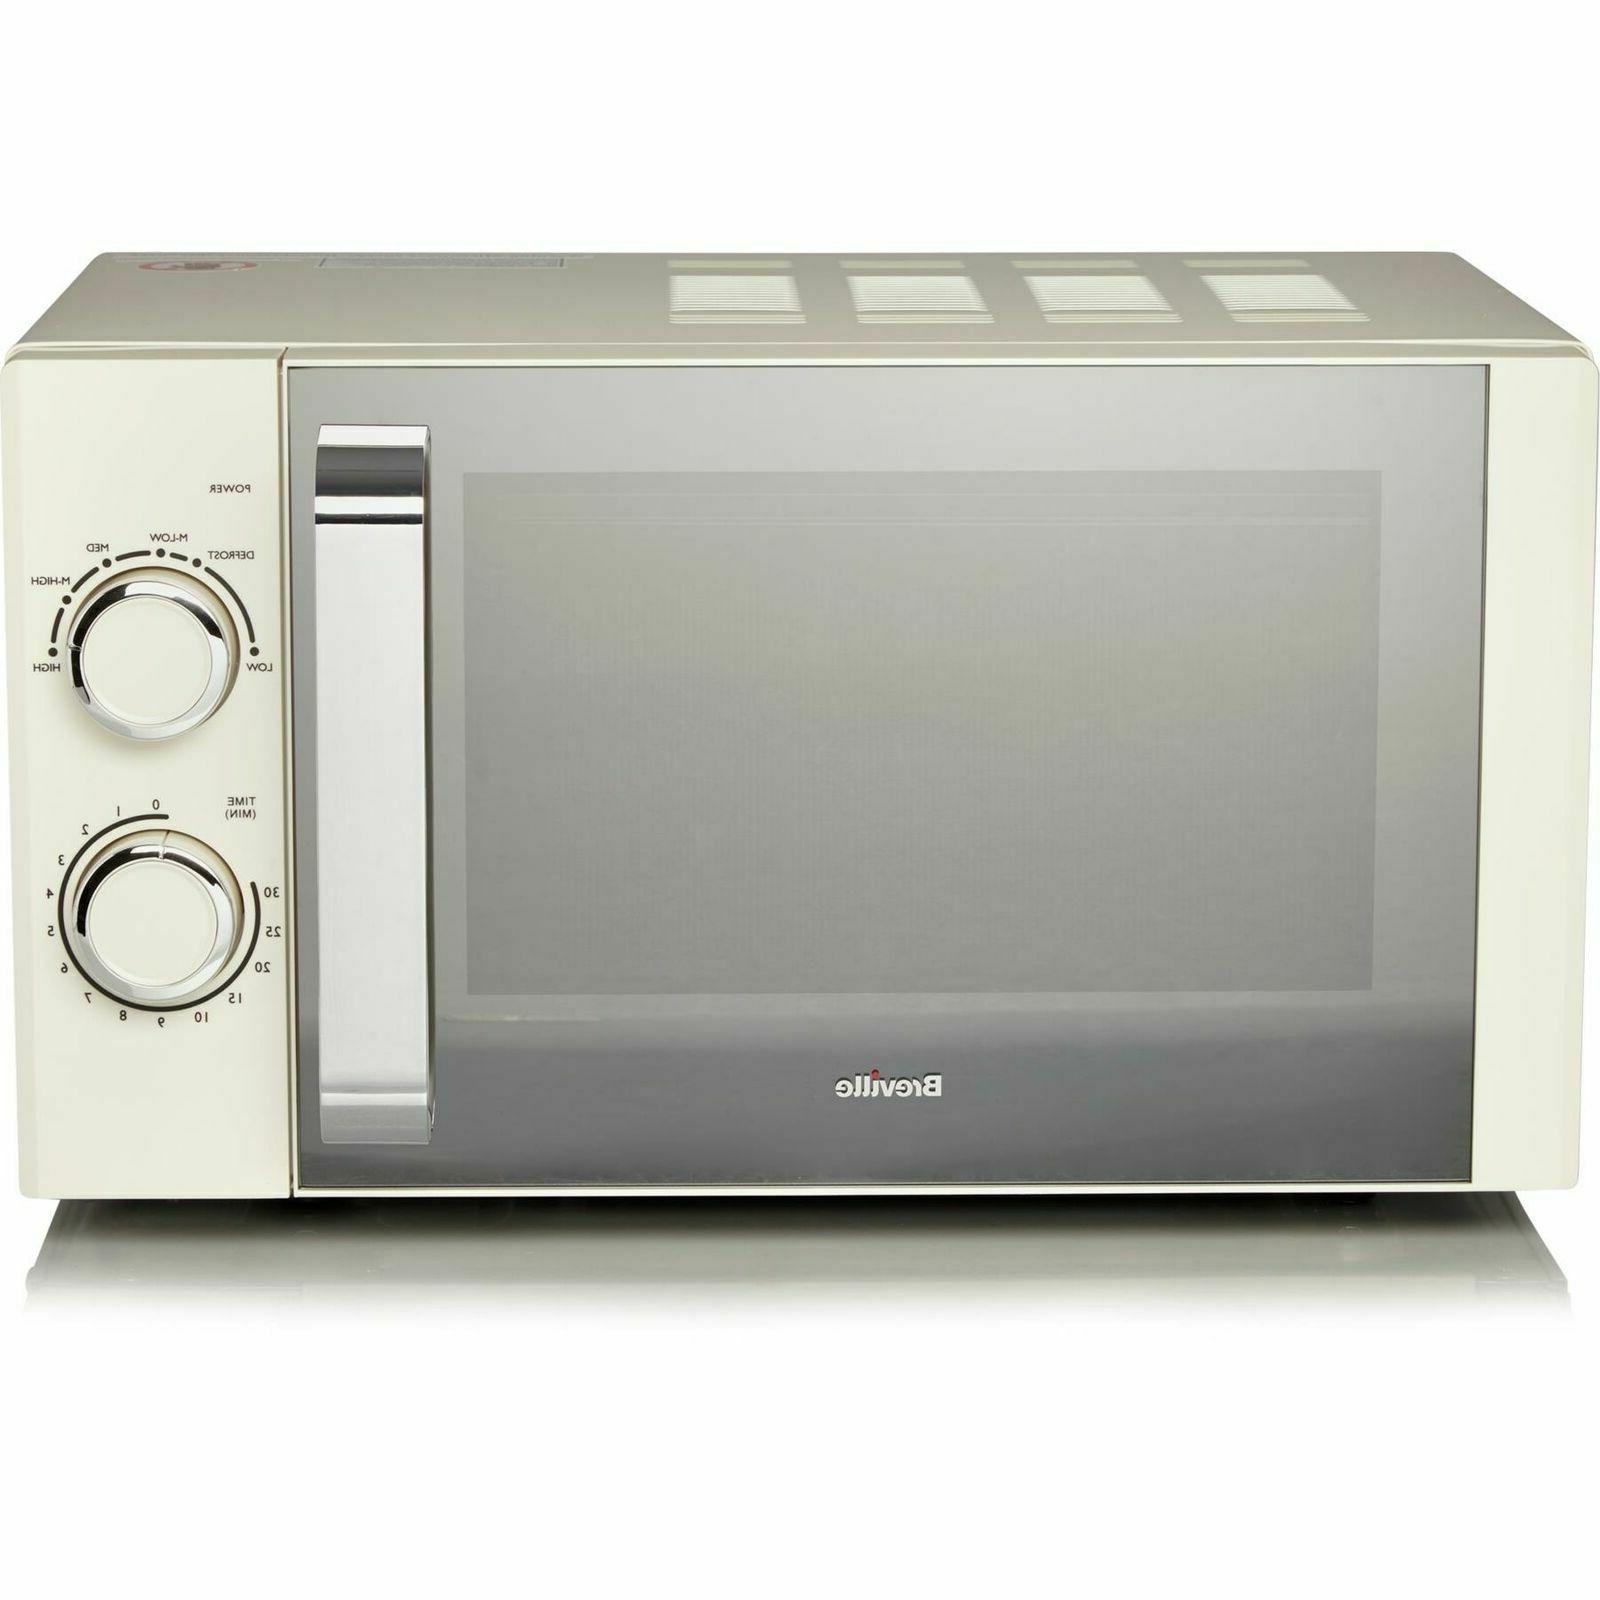 Cream Microwave Oven 17L Buy Kitchen Breville Best